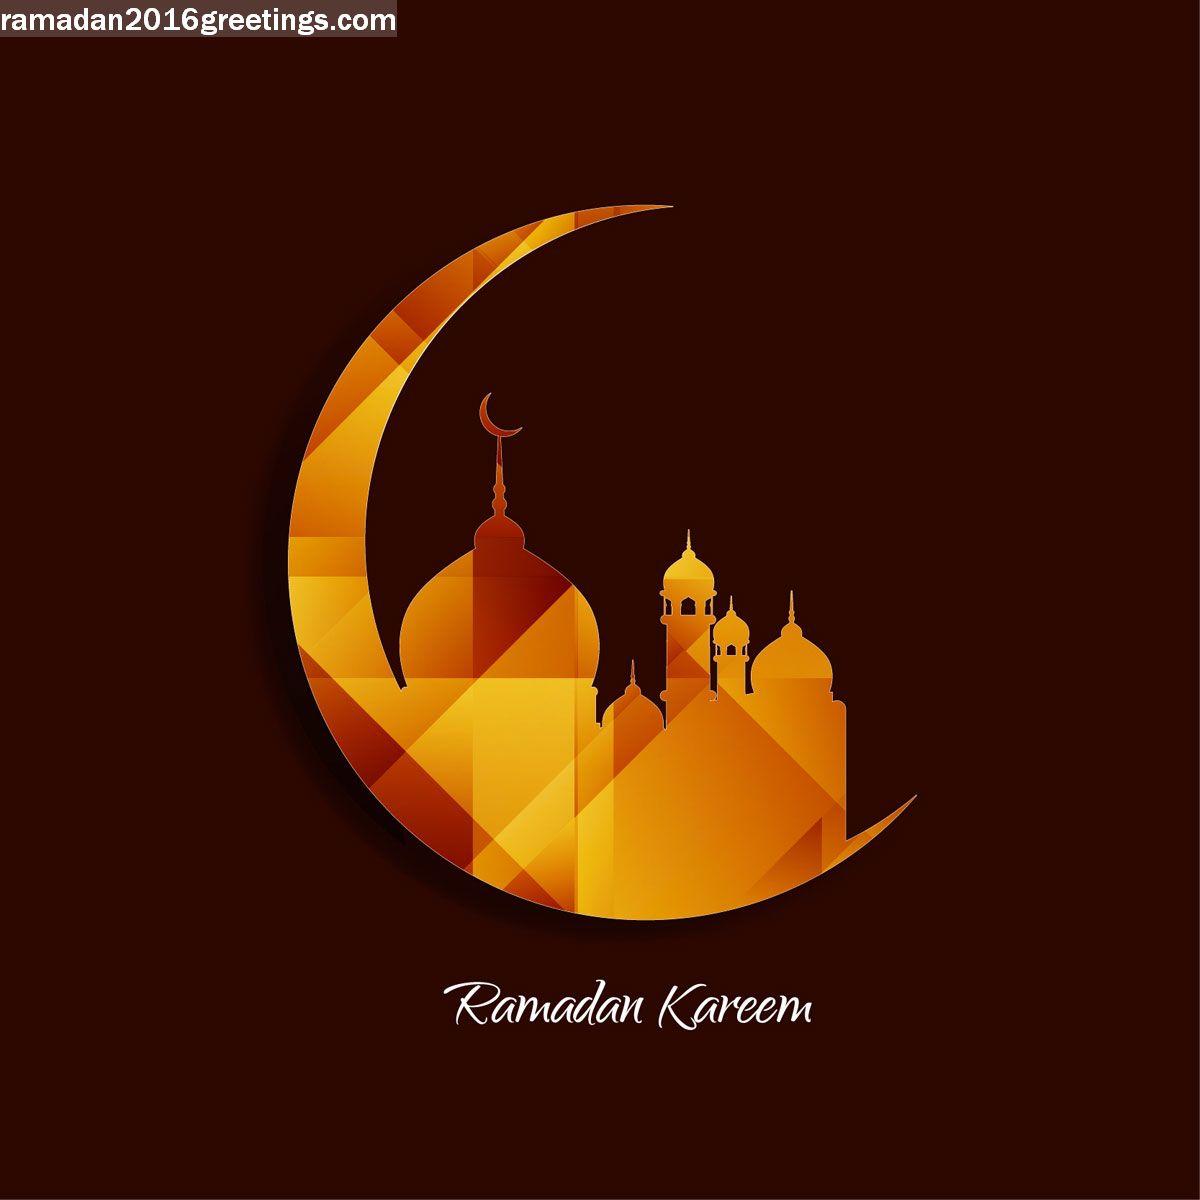 Must see Whatsapp Eid Al-Fitr Greeting - ramadan-2016-hd-wallpaper-greetings-card  Graphic_646059 .jpg